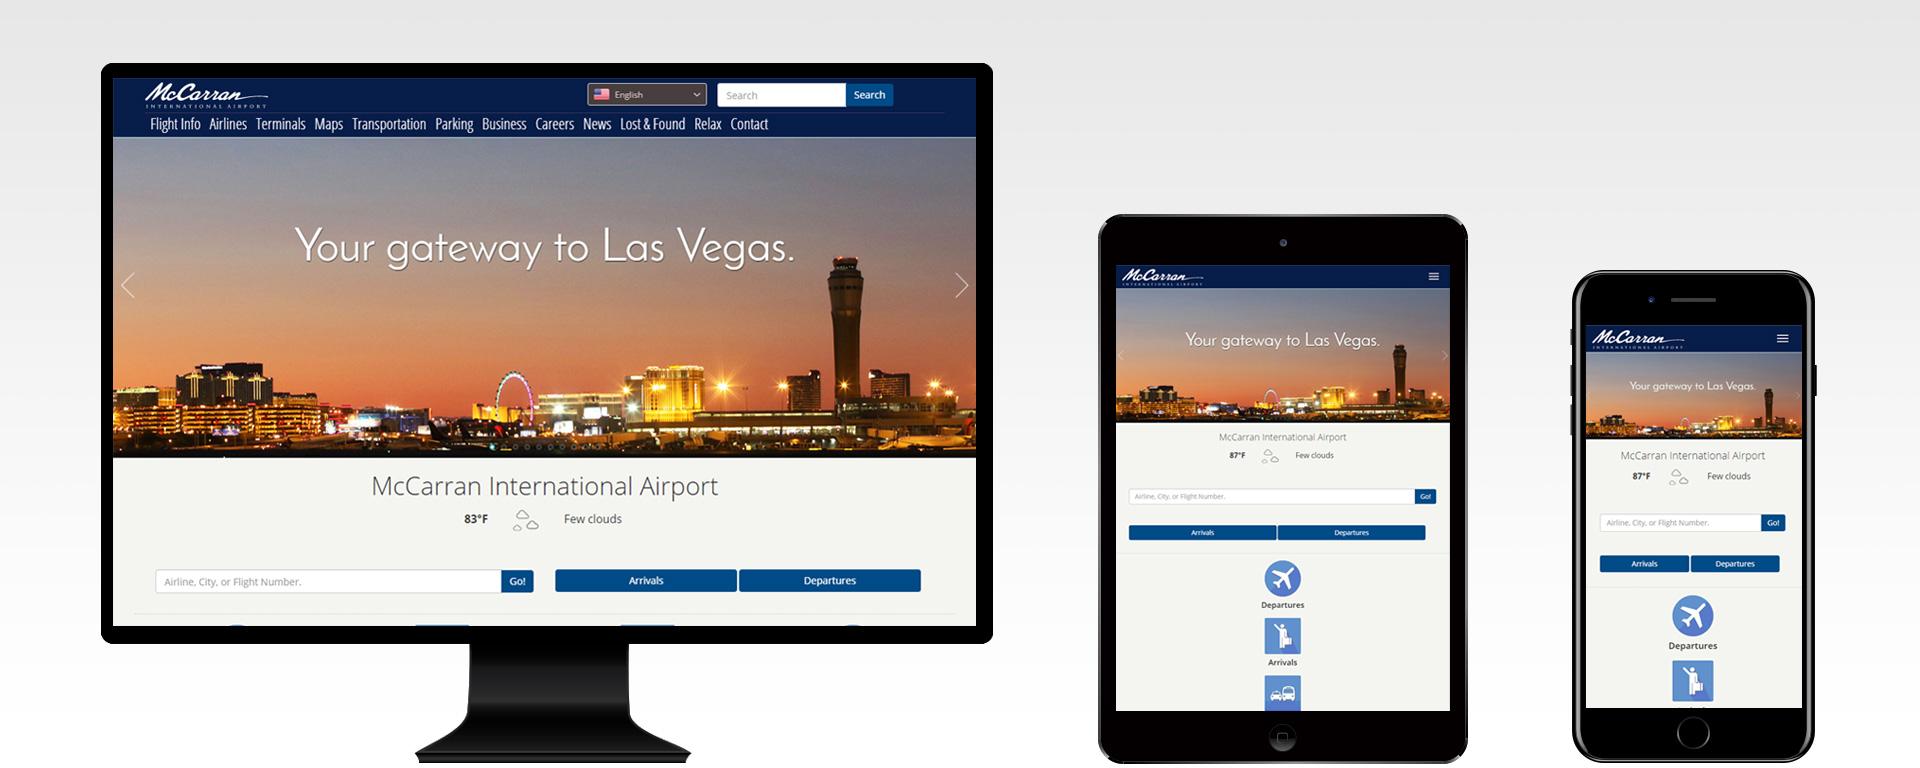 'McCarran International Airport' from the web at 'https://www.mccarran.com/FSWeb/assets/LAS/images/images_jssor/LAS_home_website_1920x768.jpg'